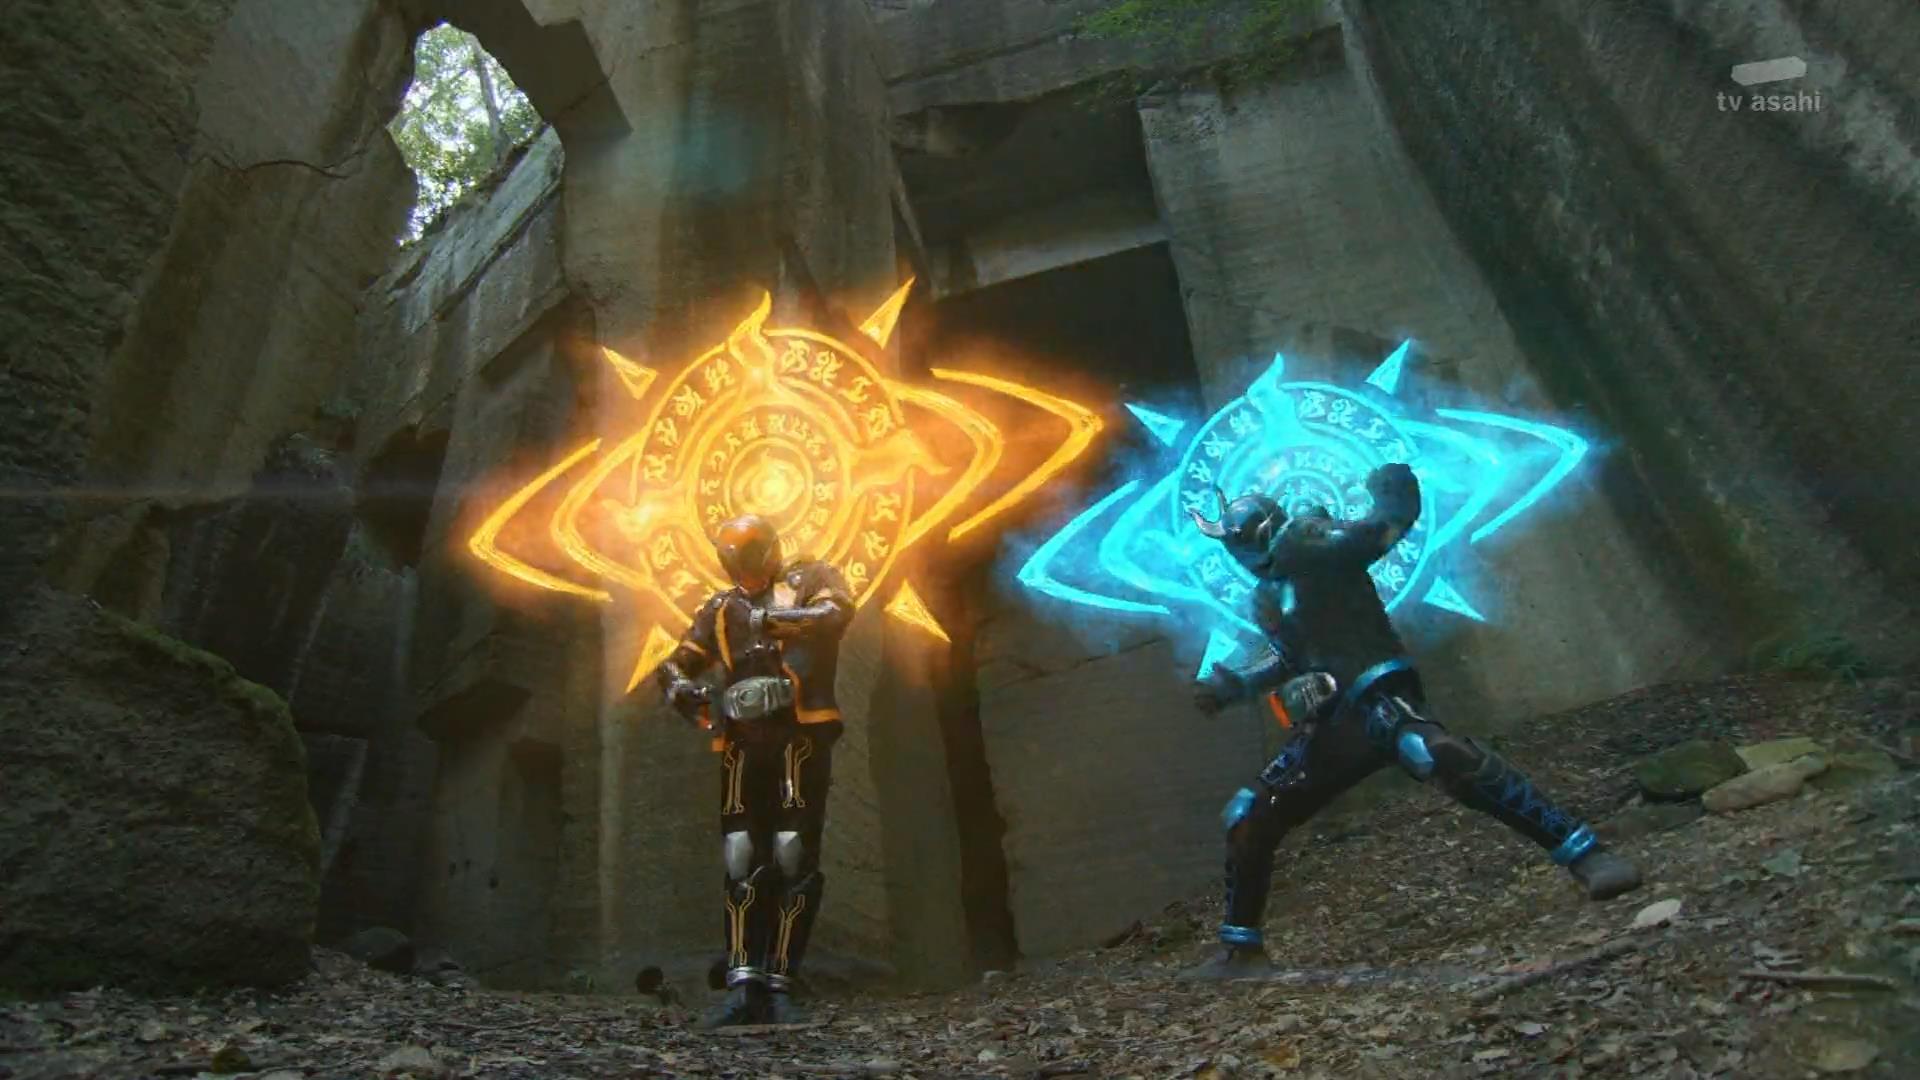 Toku Secrets Podcast: Episode 18 – Kamen Rider Ghost Episode 11 Review